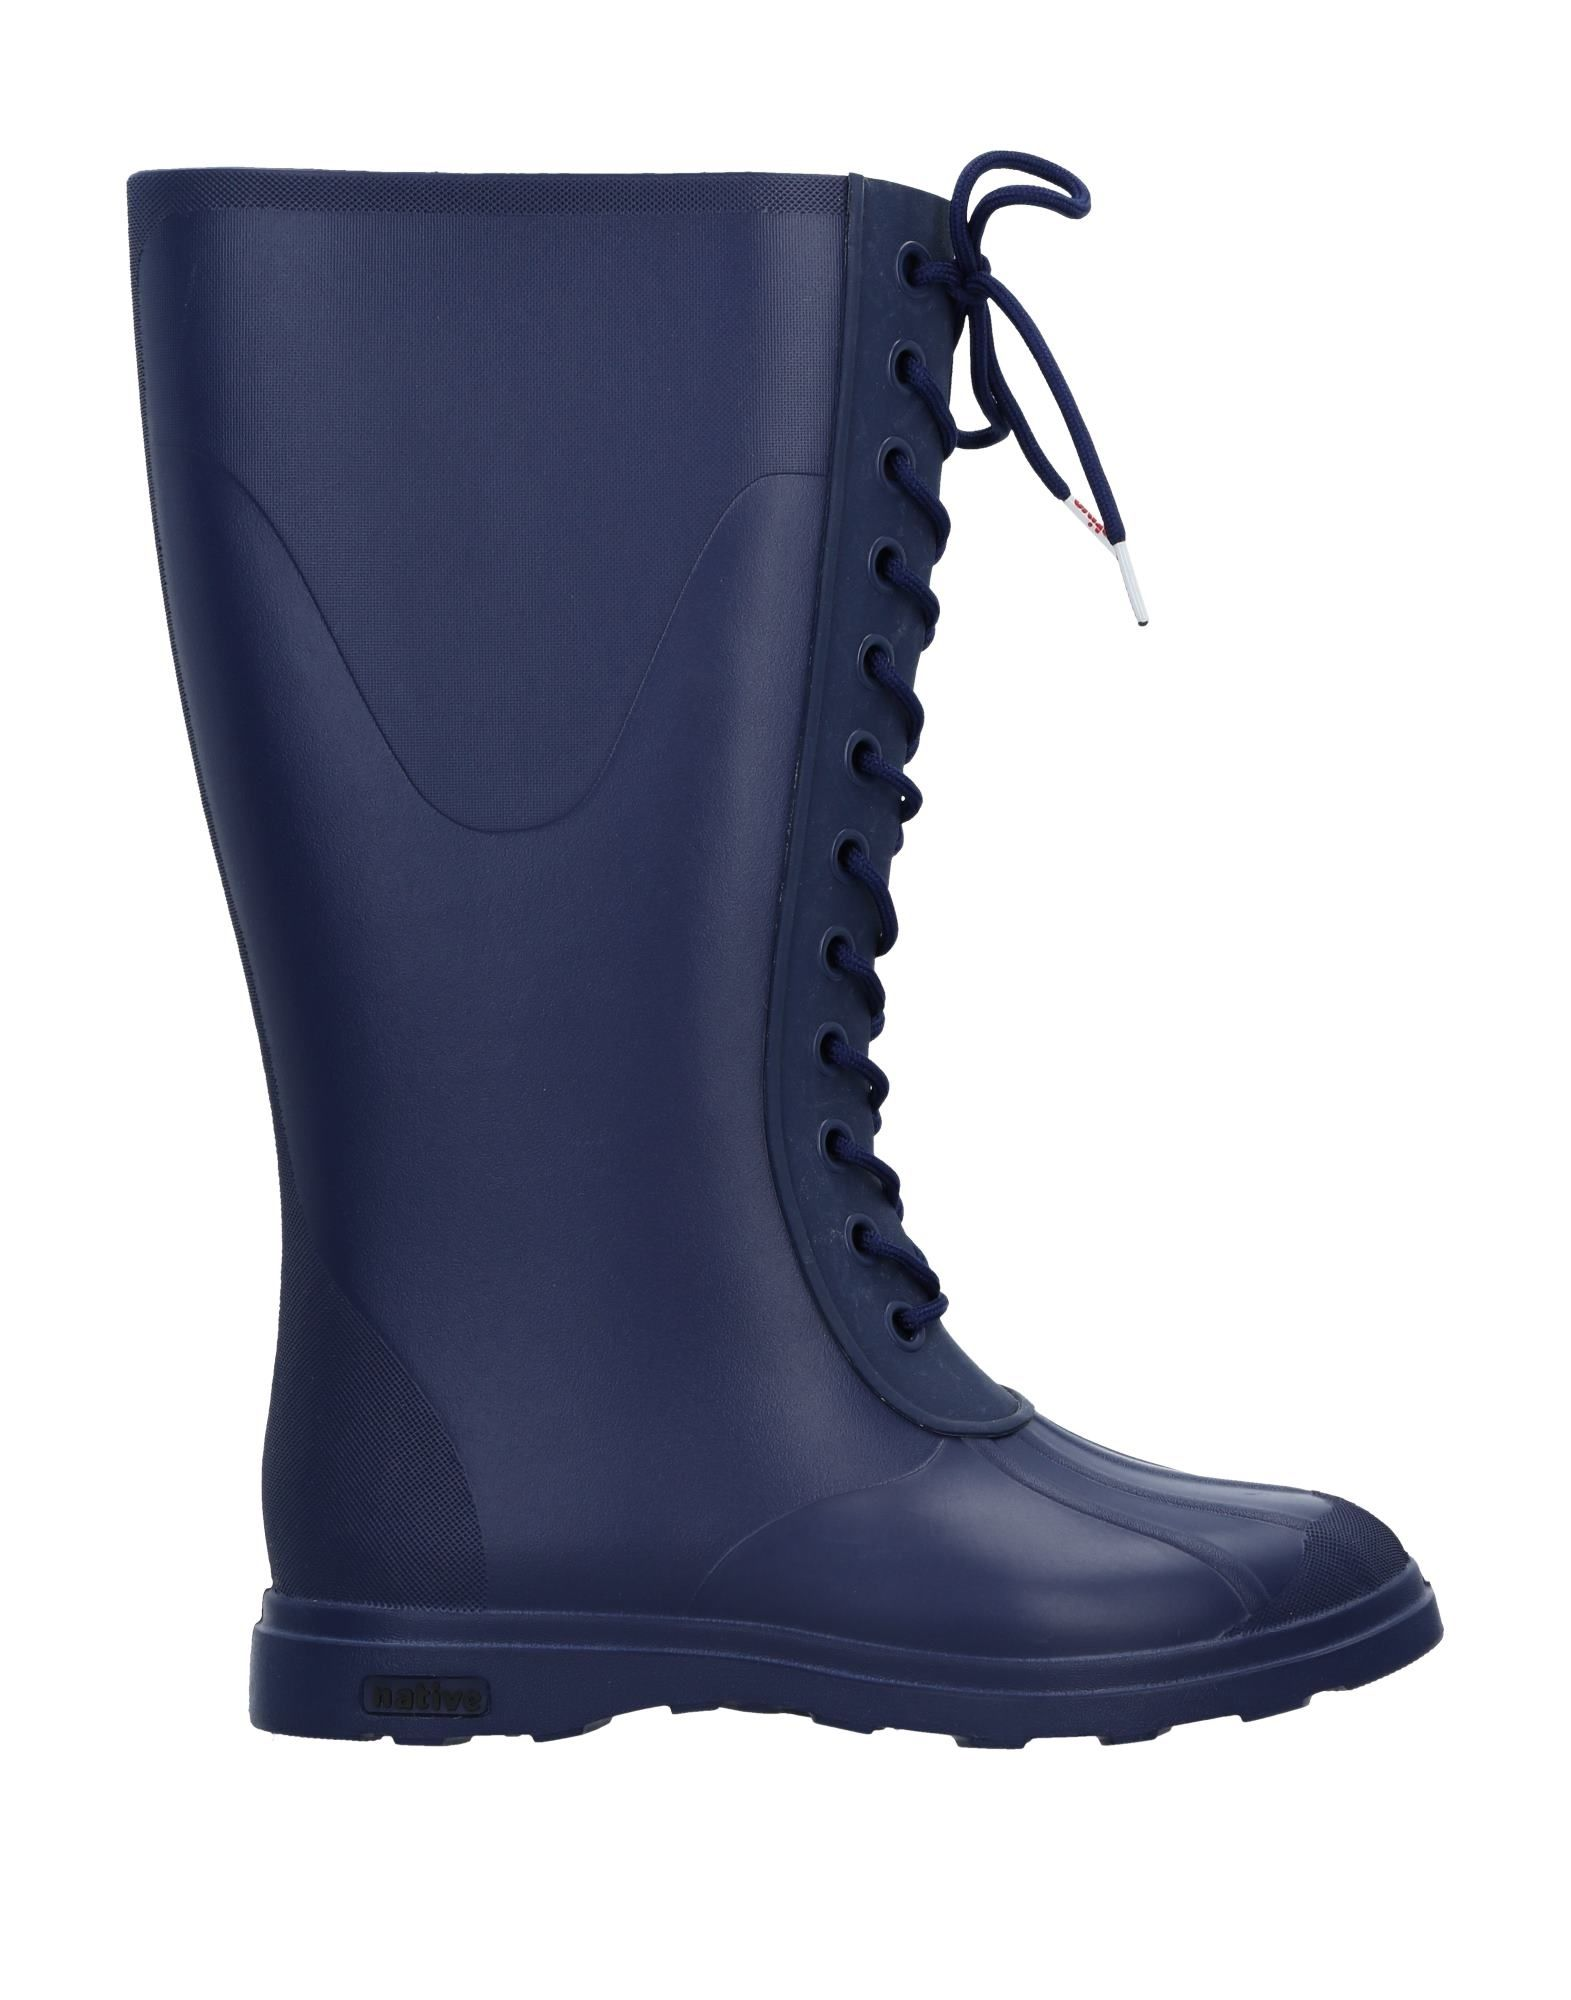 Native Boots - Women  Native Boots online on  Women Australia - 11533865PP b58195